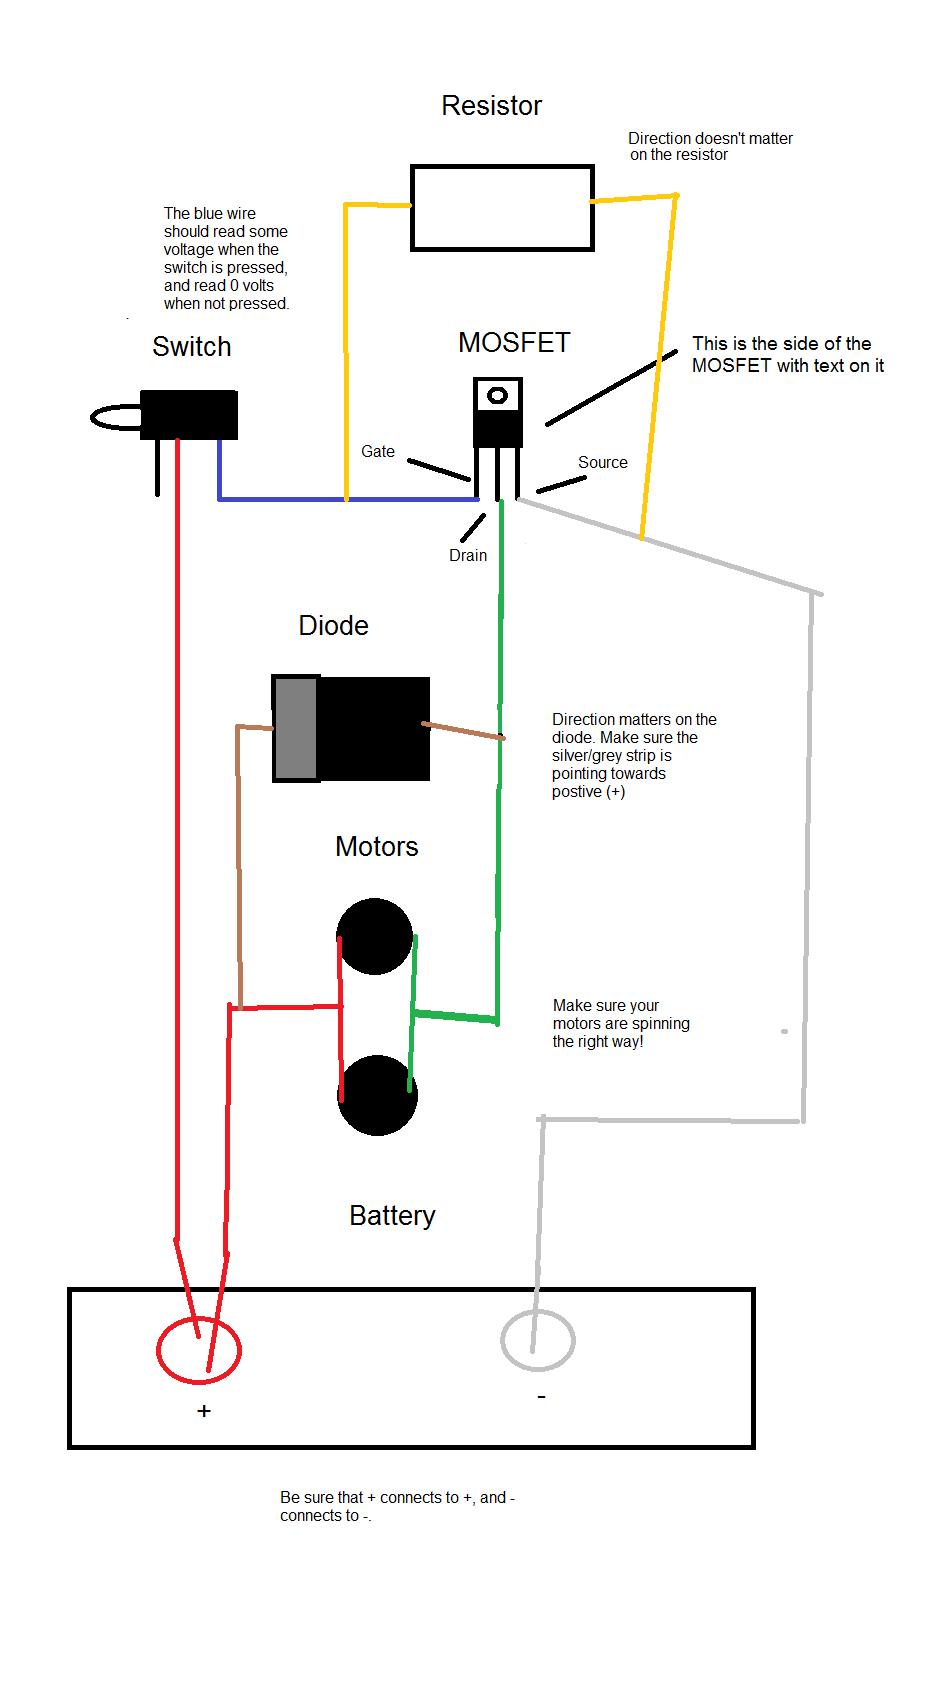 Mosfet Wiring Diagram - Wiring Diagram Omano Schematics • - Tevo Tarantula Wiring Diagram